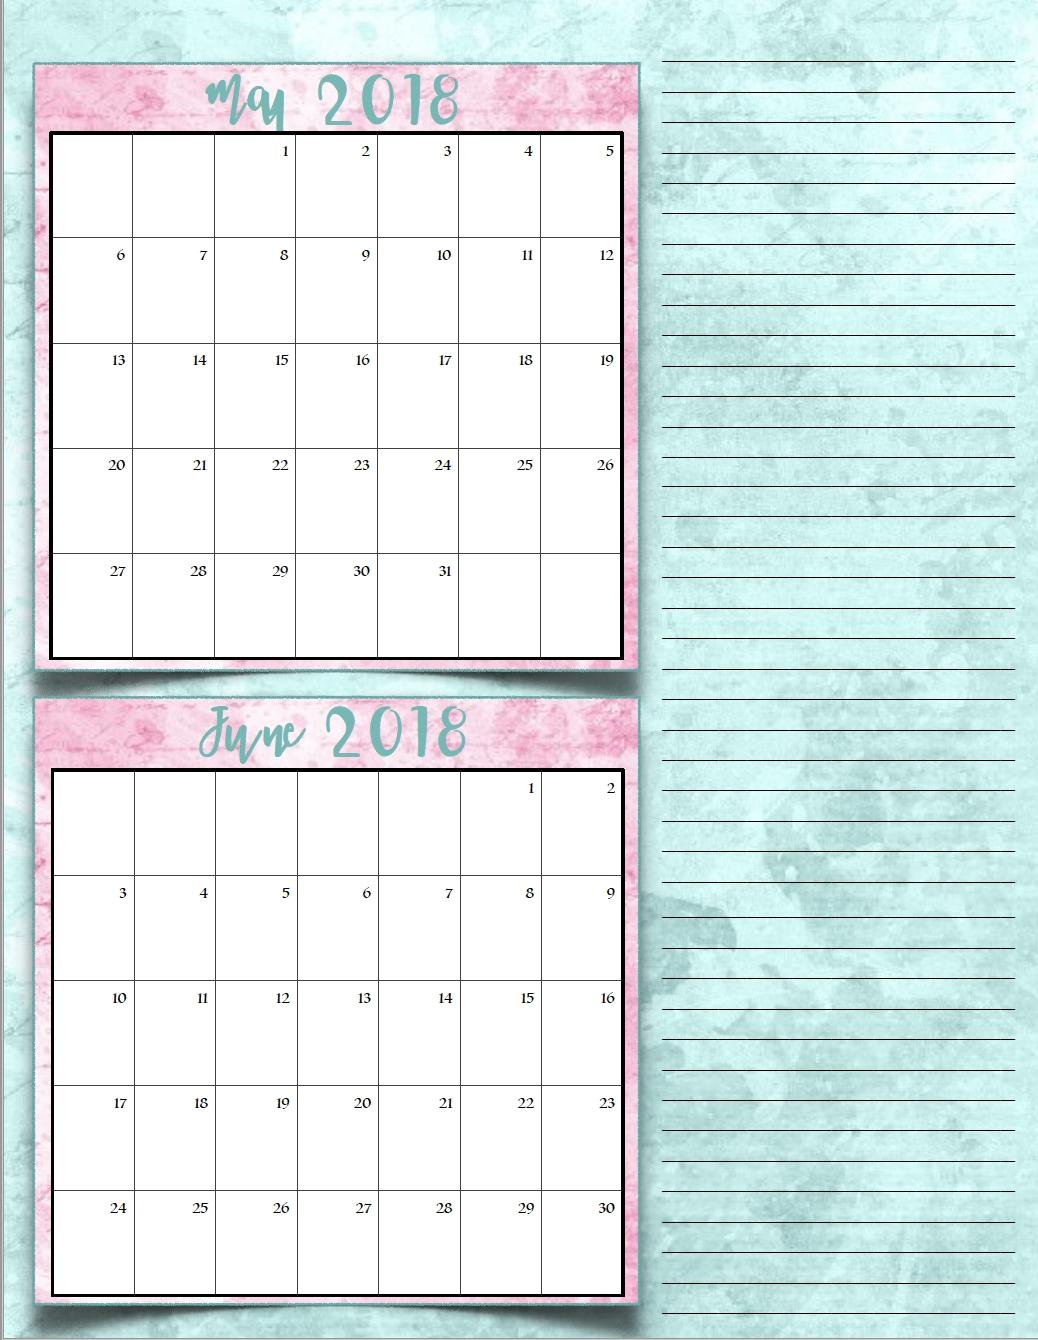 Free Printable 2018 Bimonthly Calendars 6 Designs3abry